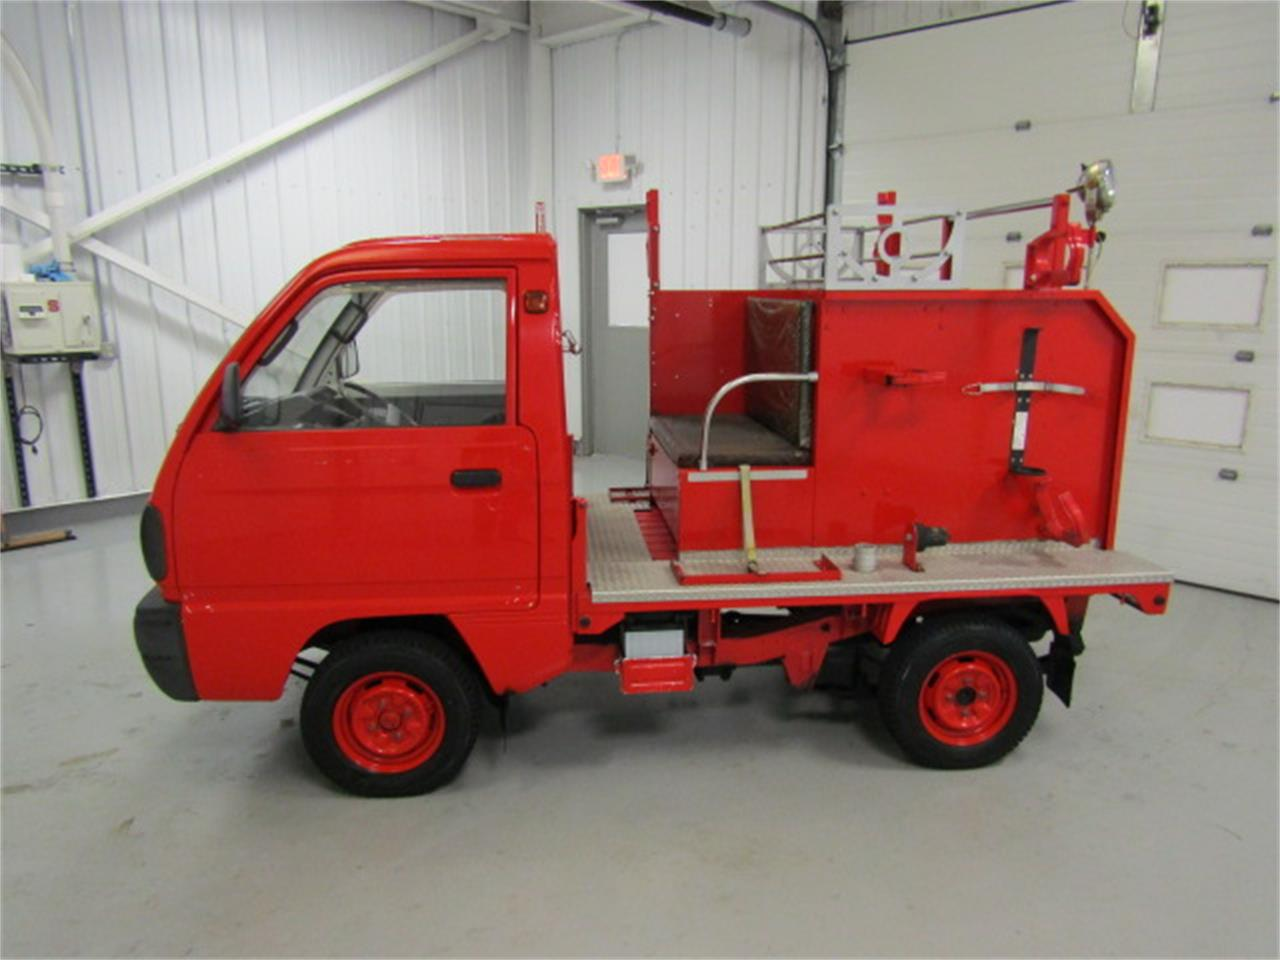 Large Picture of '91 Suzuki Carry located in Christiansburg Virginia - $7,989.00 - KIFI